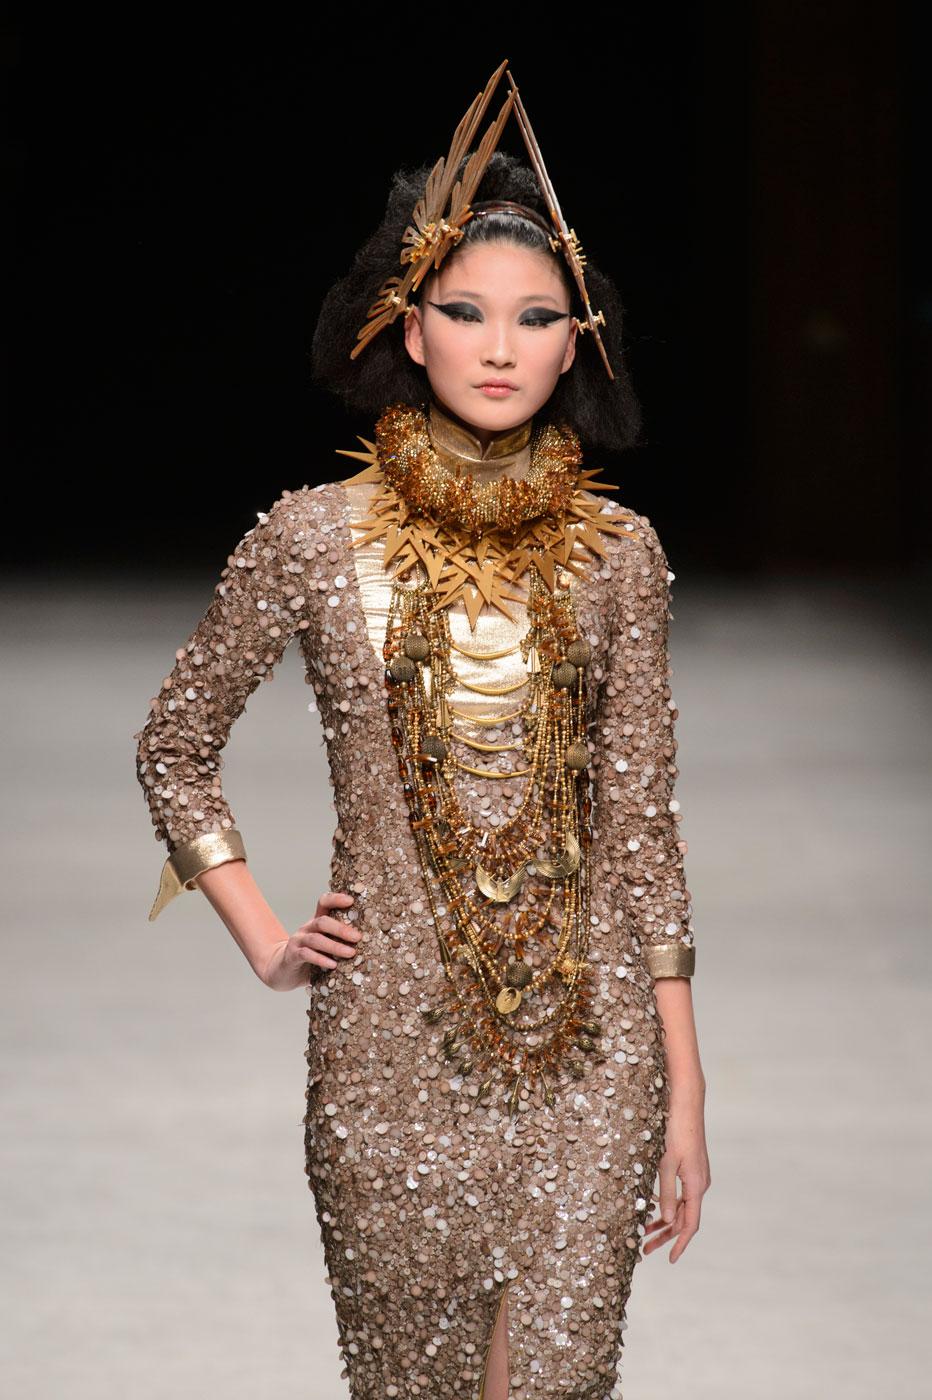 Julien-Fournie-Prive-fashion-runway-show-haute-couture-paris-spring-2015-the-impression-59